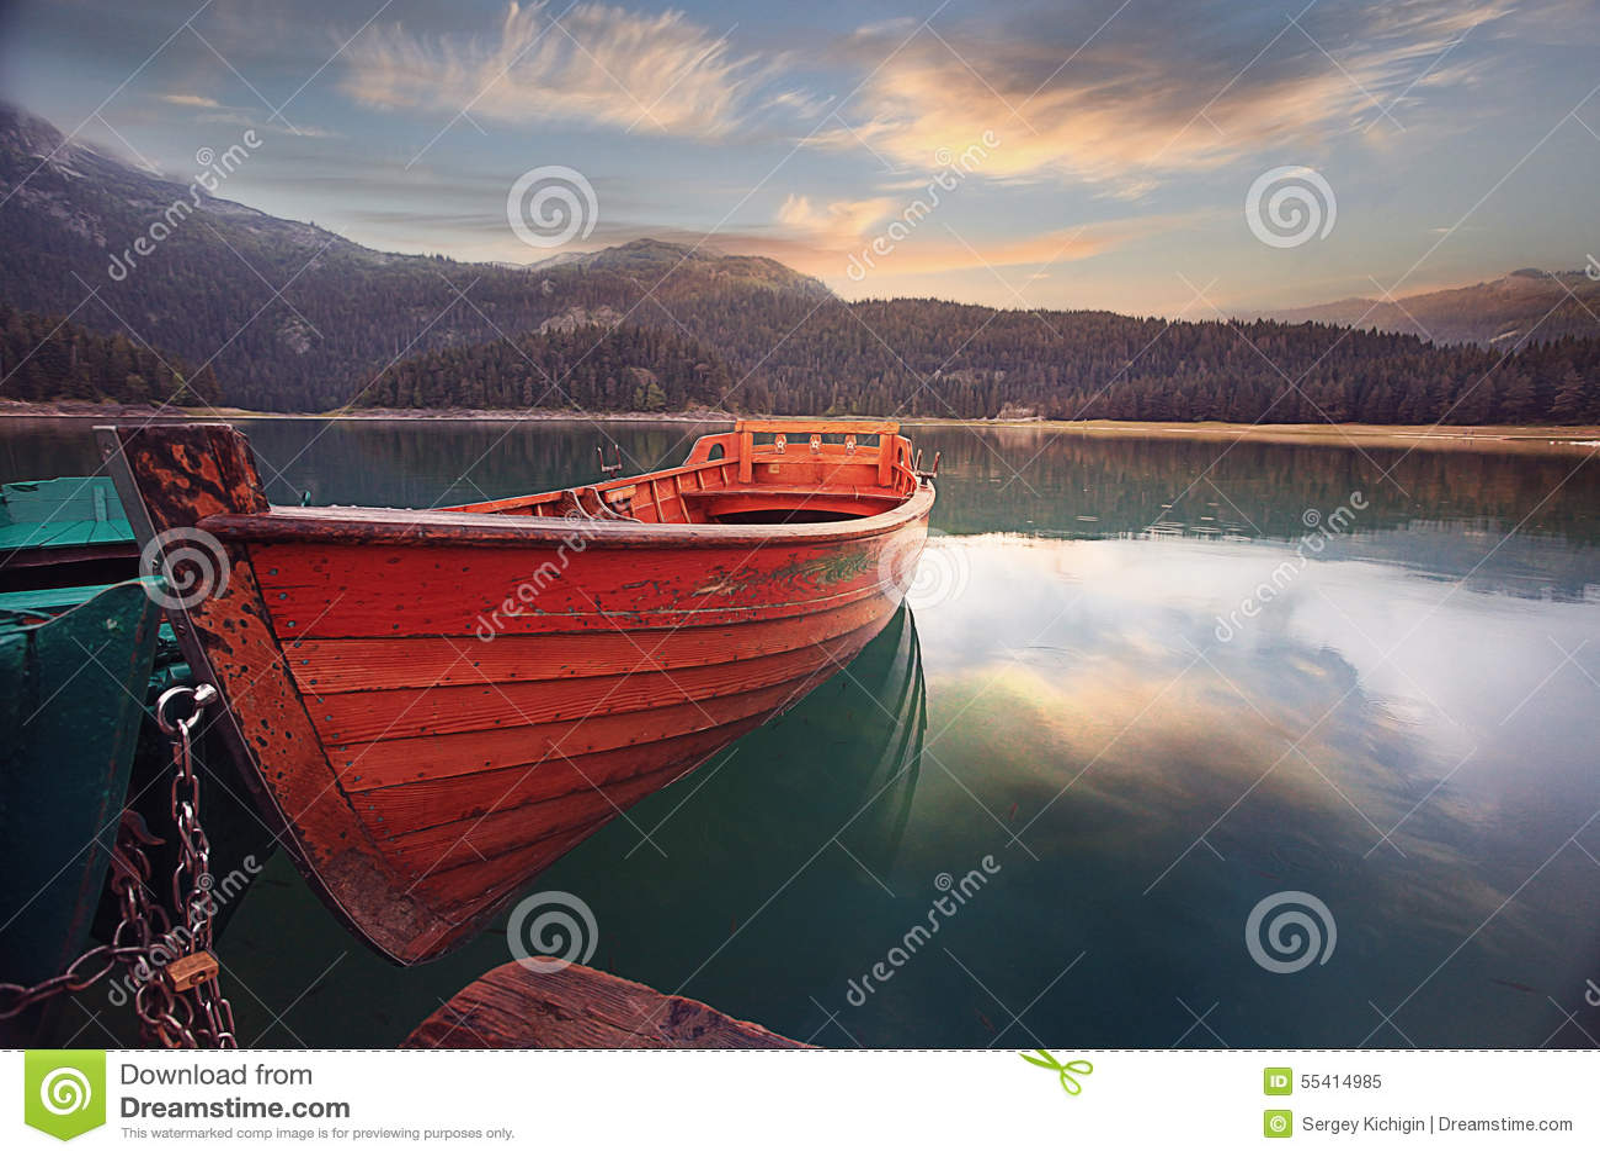 Boat On A Mooring Mountain Lake Stock Image - Image: 55414985